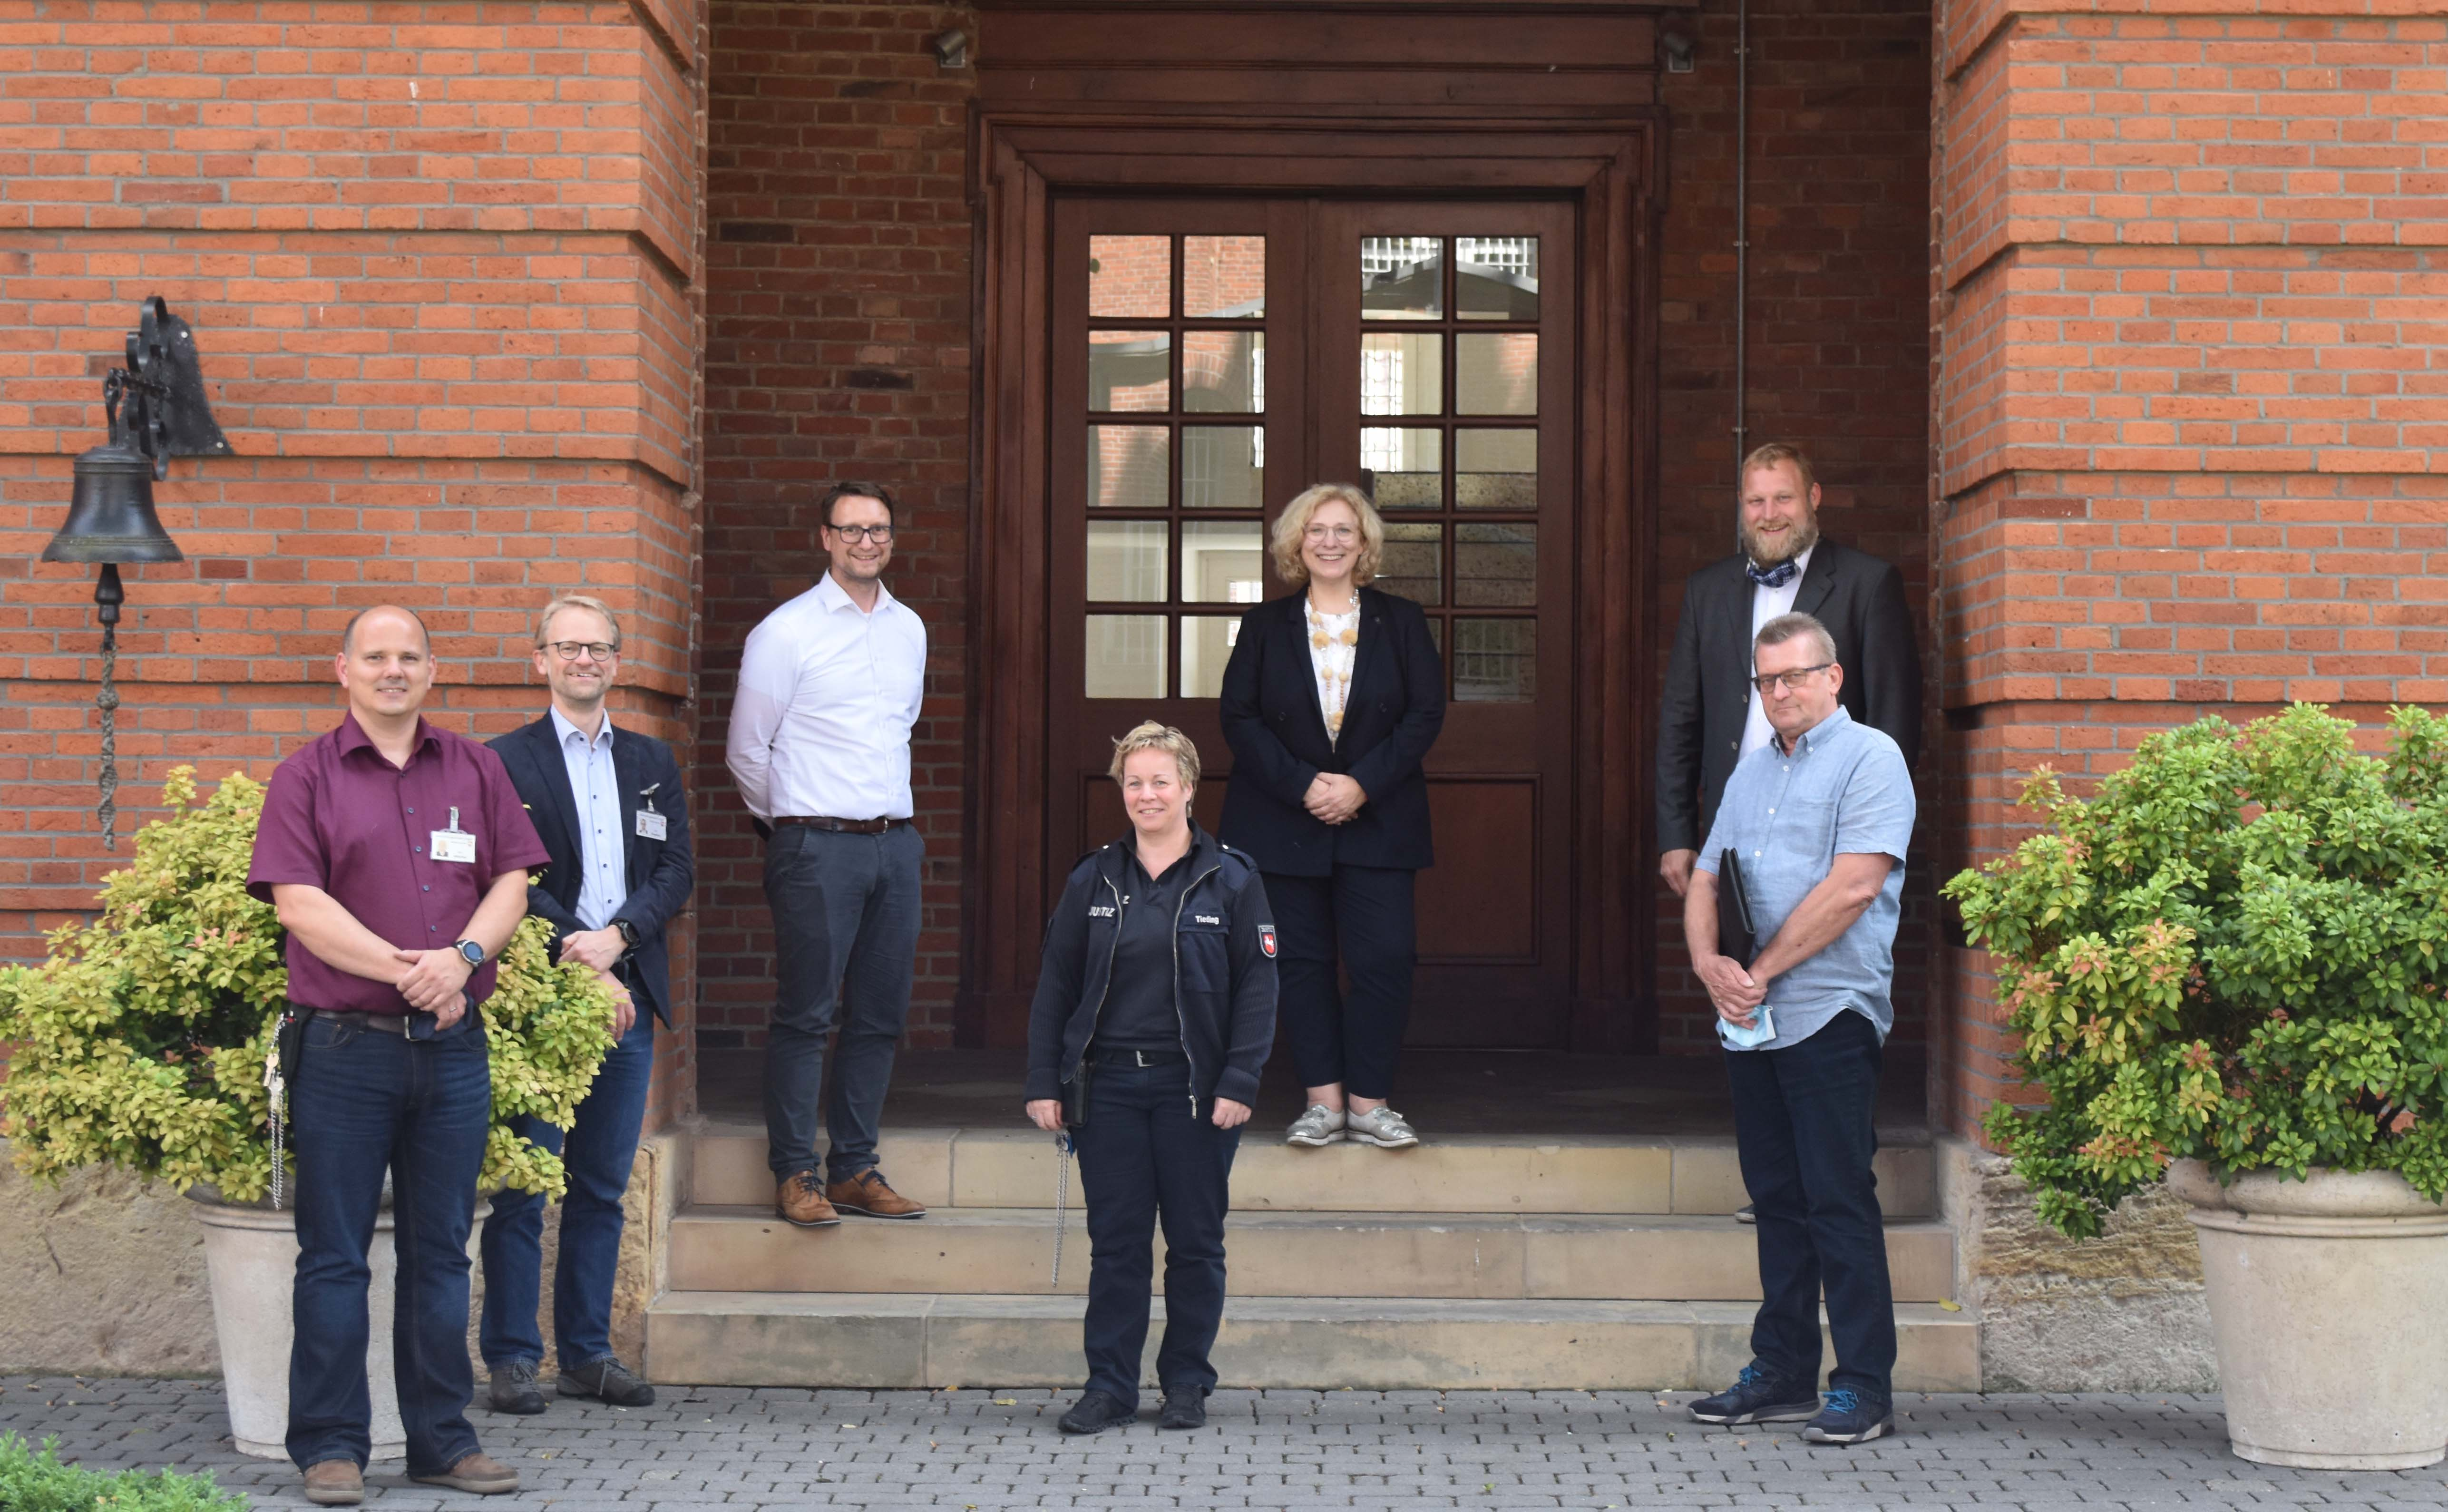 V.l.n.r.: Markus Hölscher (Fachbereichsleiter Personal JVA Lingen), Mathias Hinghaus (stv. Anstaltsleiter), Meik Portmann (Anstaltsleiter JVA Lingen),  Antje Tieding (Vorsitzende des Personalrats),  Dr. Daniela De Ridder (MdB), Ulf Prange (MdL), Georg Thole (SPD-Ortsverein Lingen)